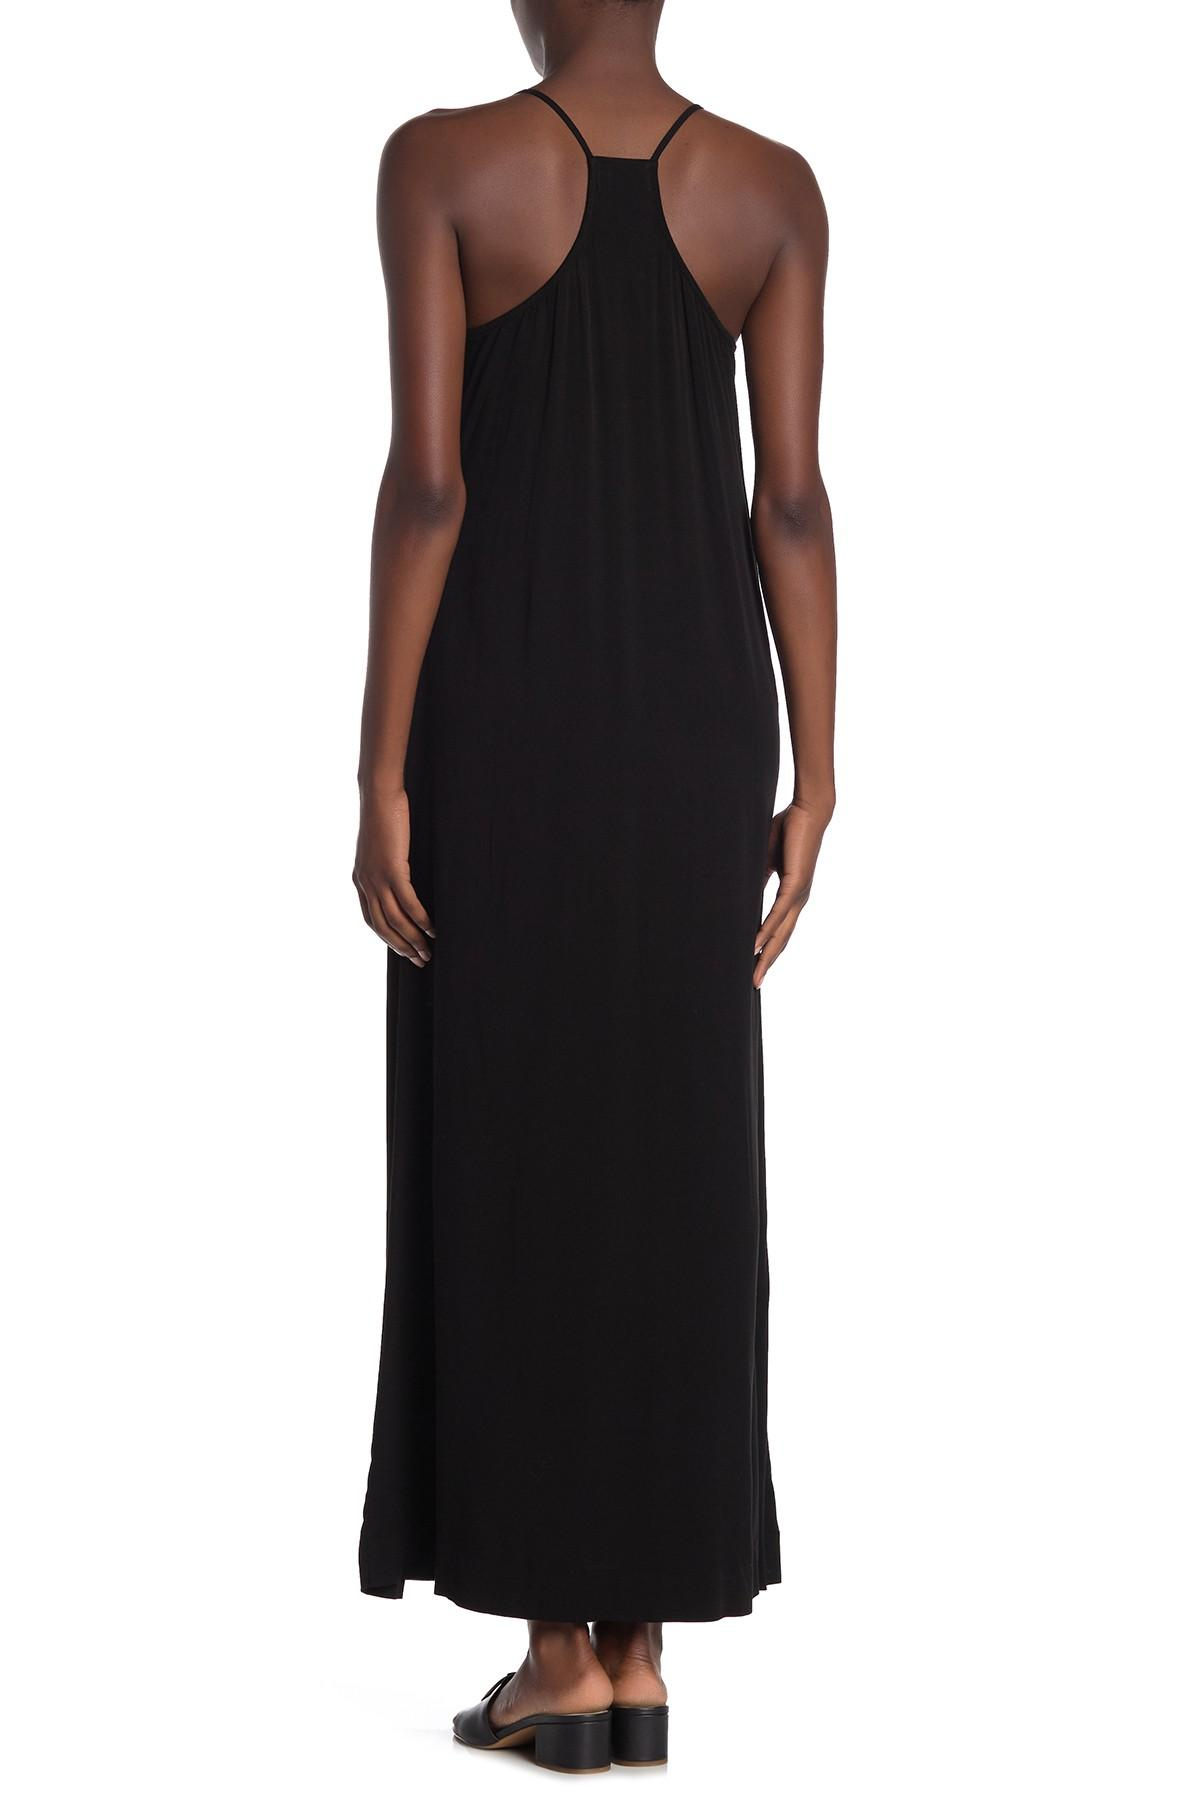 ae597e2de64 Michael Stars Rylie Rayon Babydoll Cami Maxi Dress in Black - Lyst